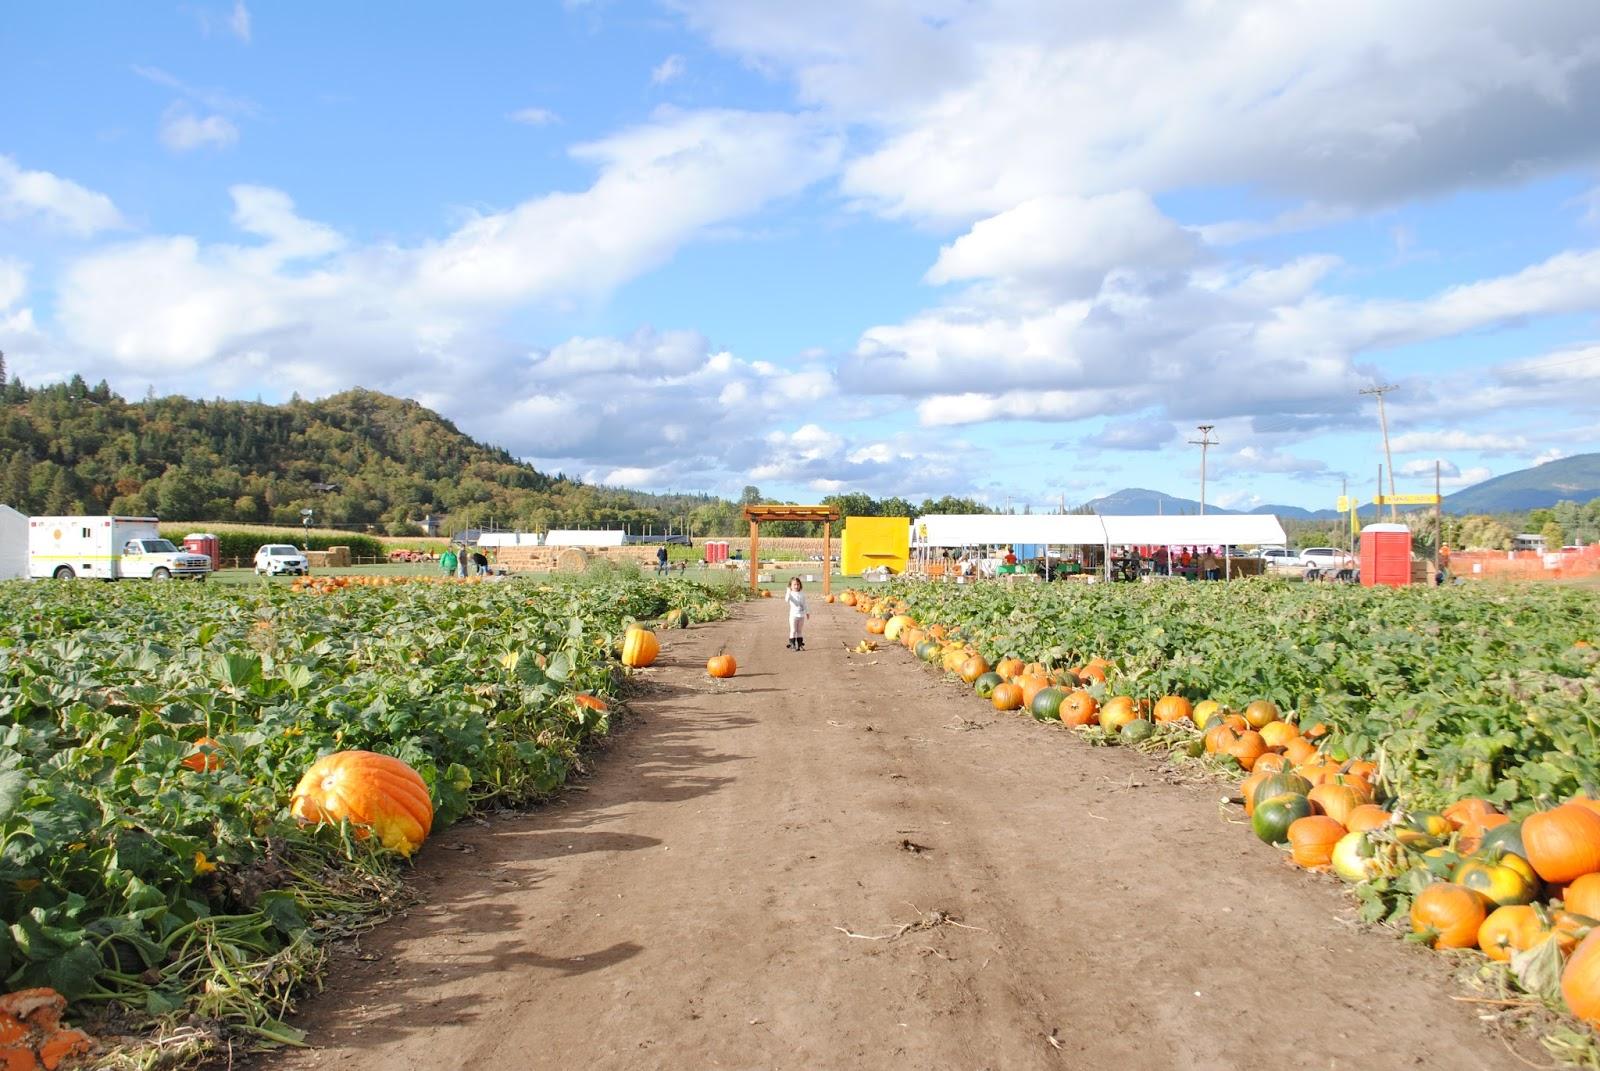 Fort Vannoy Farms Harvest Festival - Grants Pass, Oregon - Josephine County - Rogue Valley - Southern Oregon - Fall - Autumn - Pumpkin Patch - Corn Maze - Hayrides (237).JPG